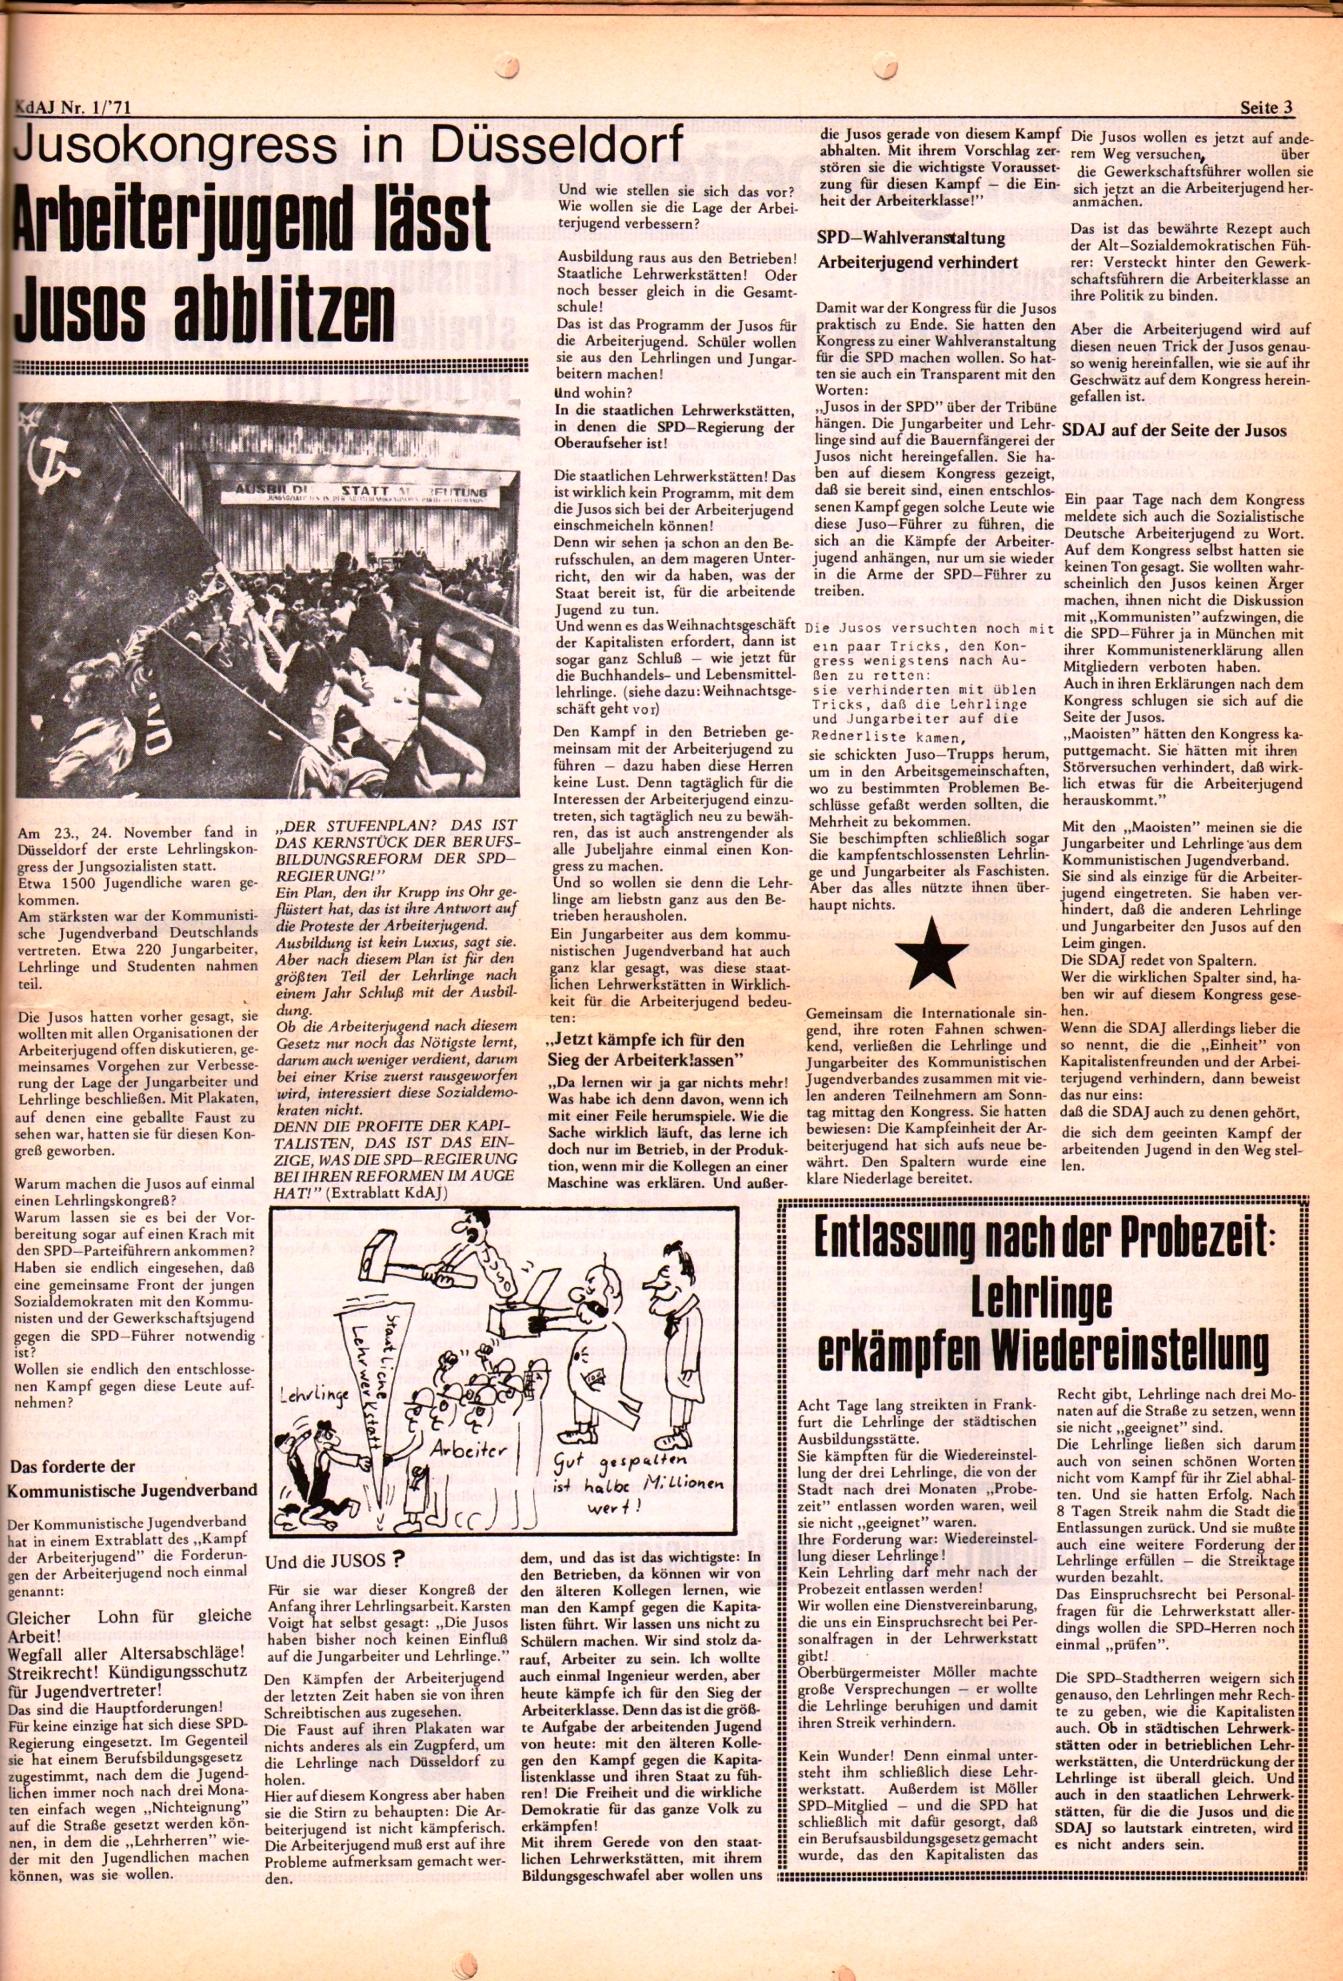 KDAJ, 2. Jg., Januar 1971, Nr. 1, Seite 3